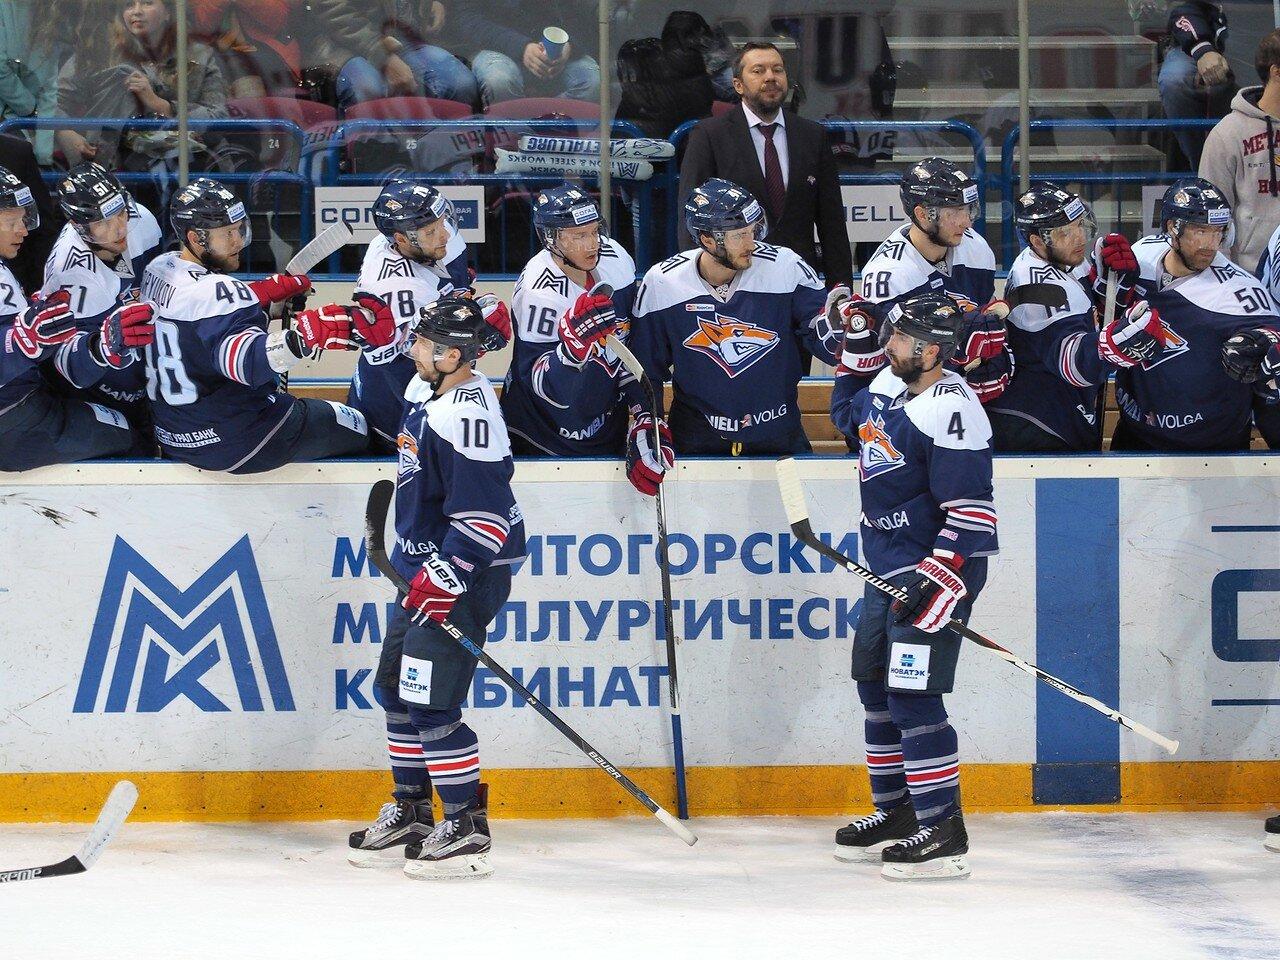 110Плей-офф 2016 Восток Финал Металлург - Салават Юлаев 23.03.2016